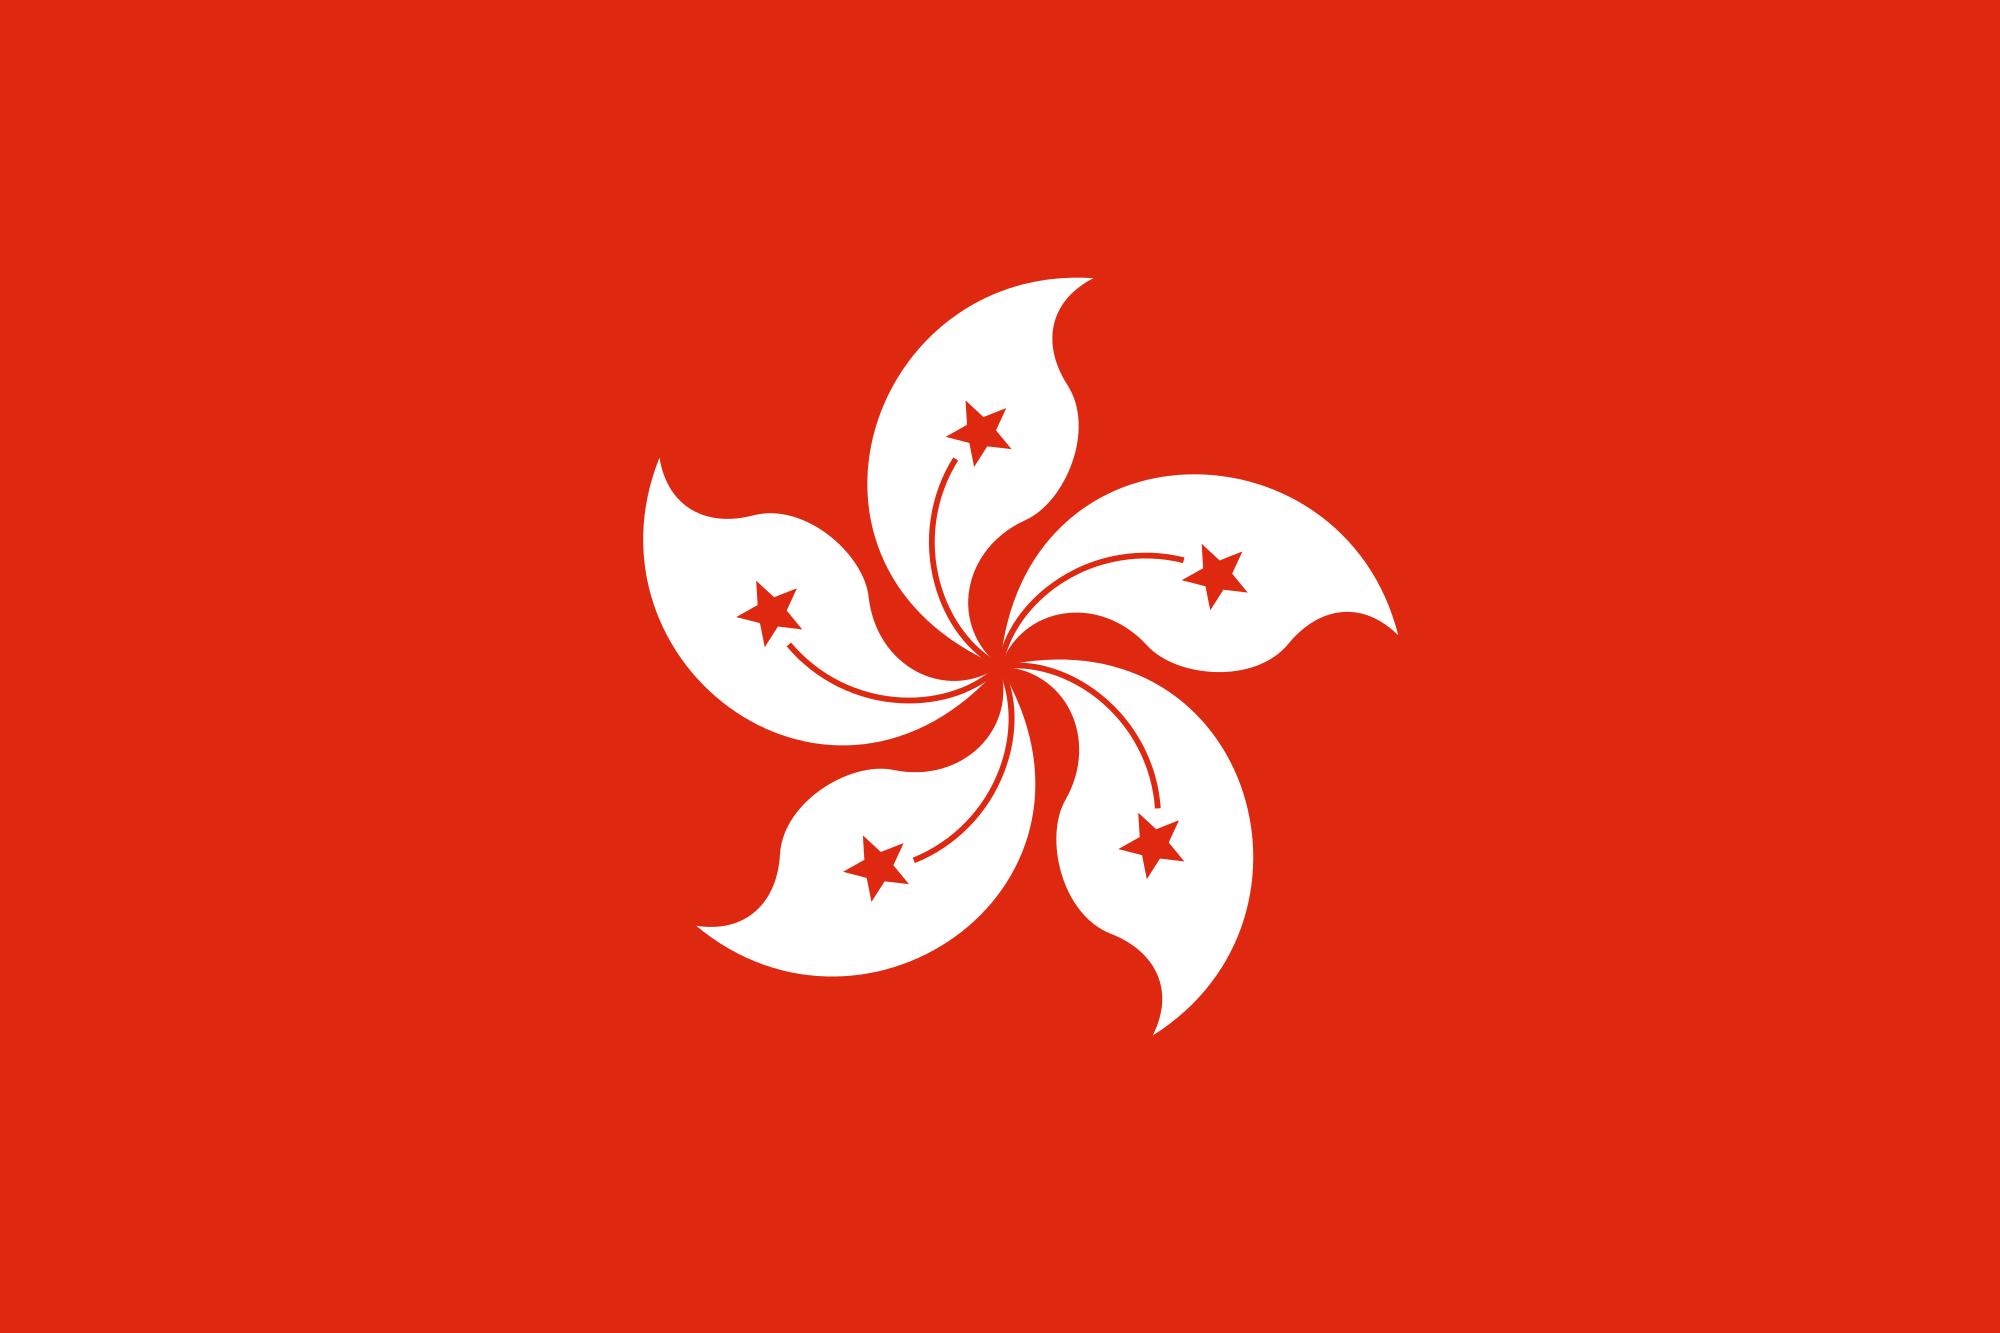 Hongkong clipart Hong Kong Flag Hong Wikimedia svg Open of